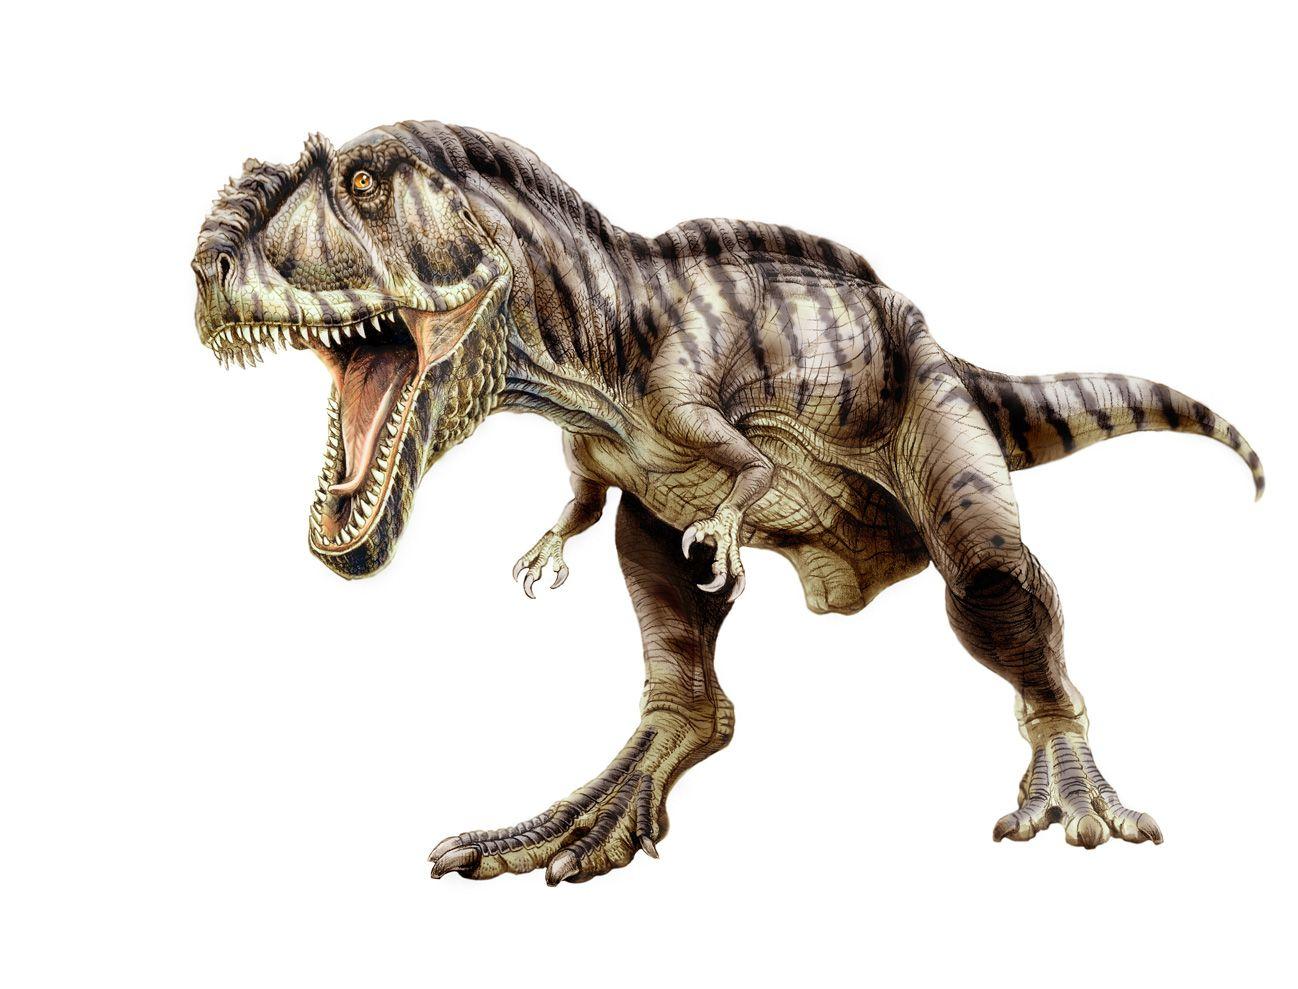 giganotosaurus by jorge antonio gonzalez gonzalezaurus on